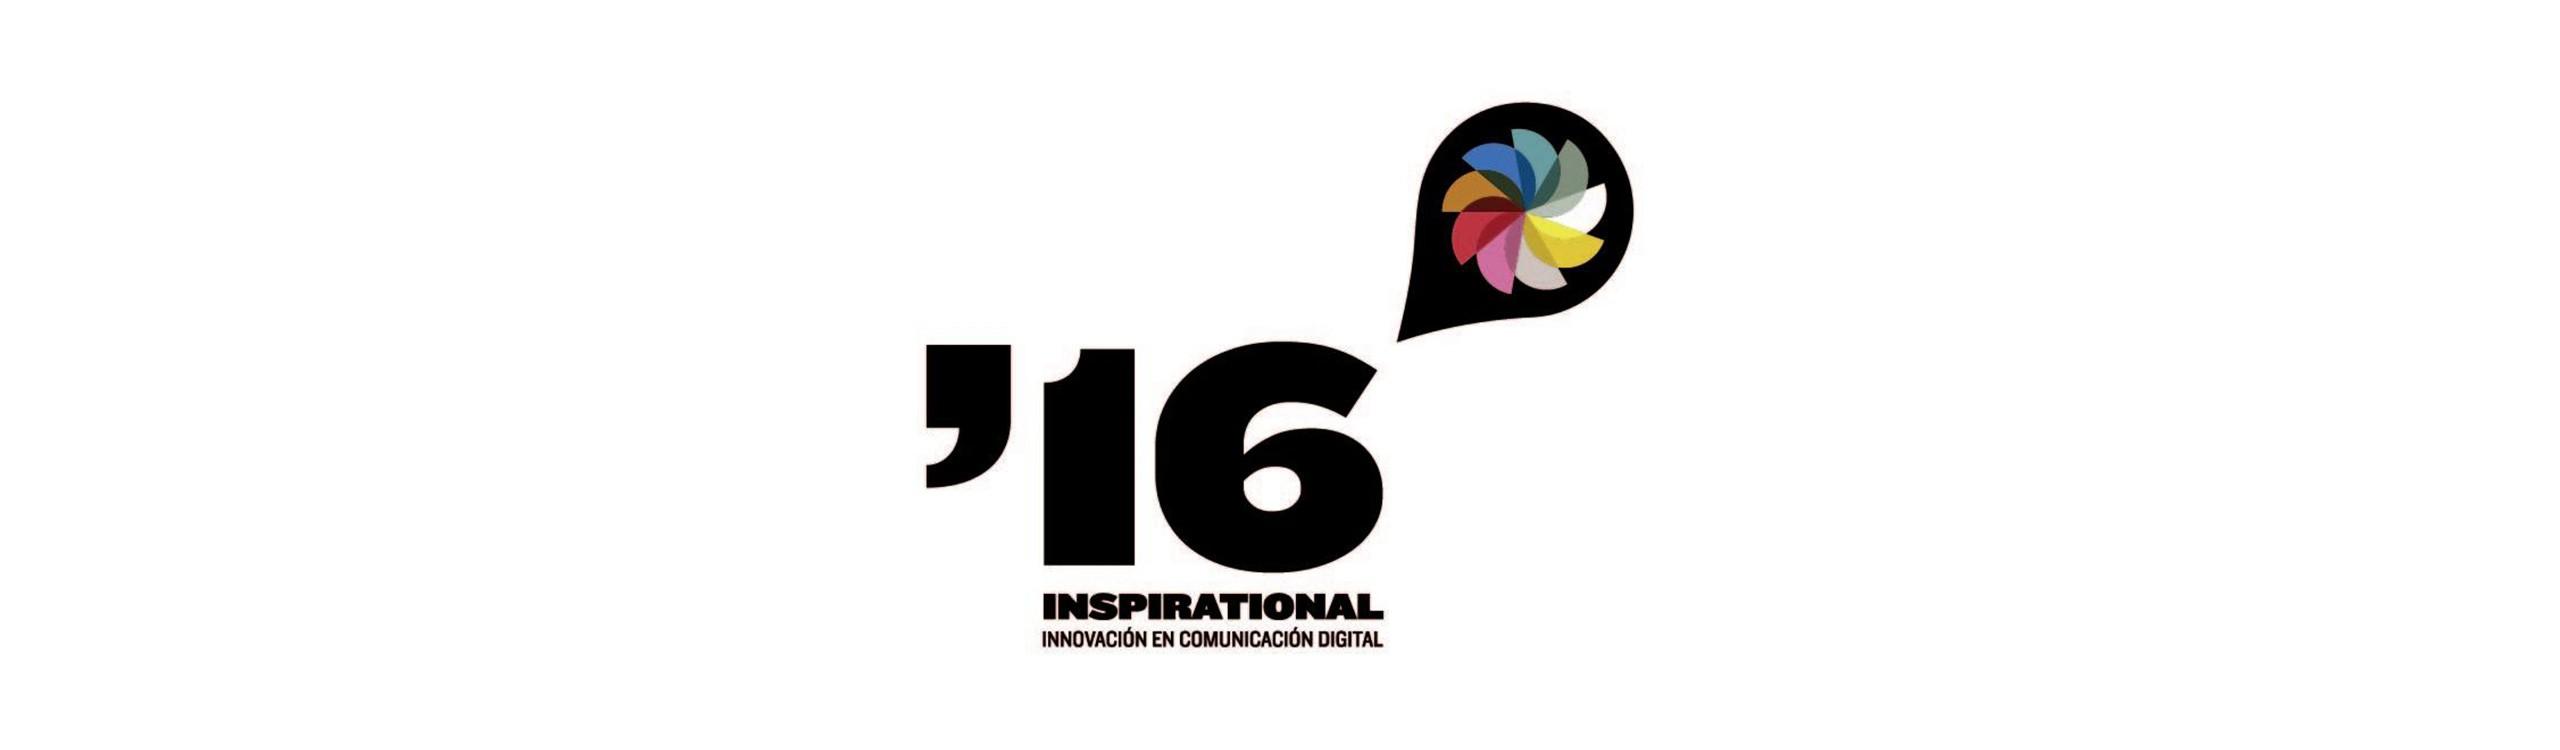 inspirational16 mis gafas de pasta01